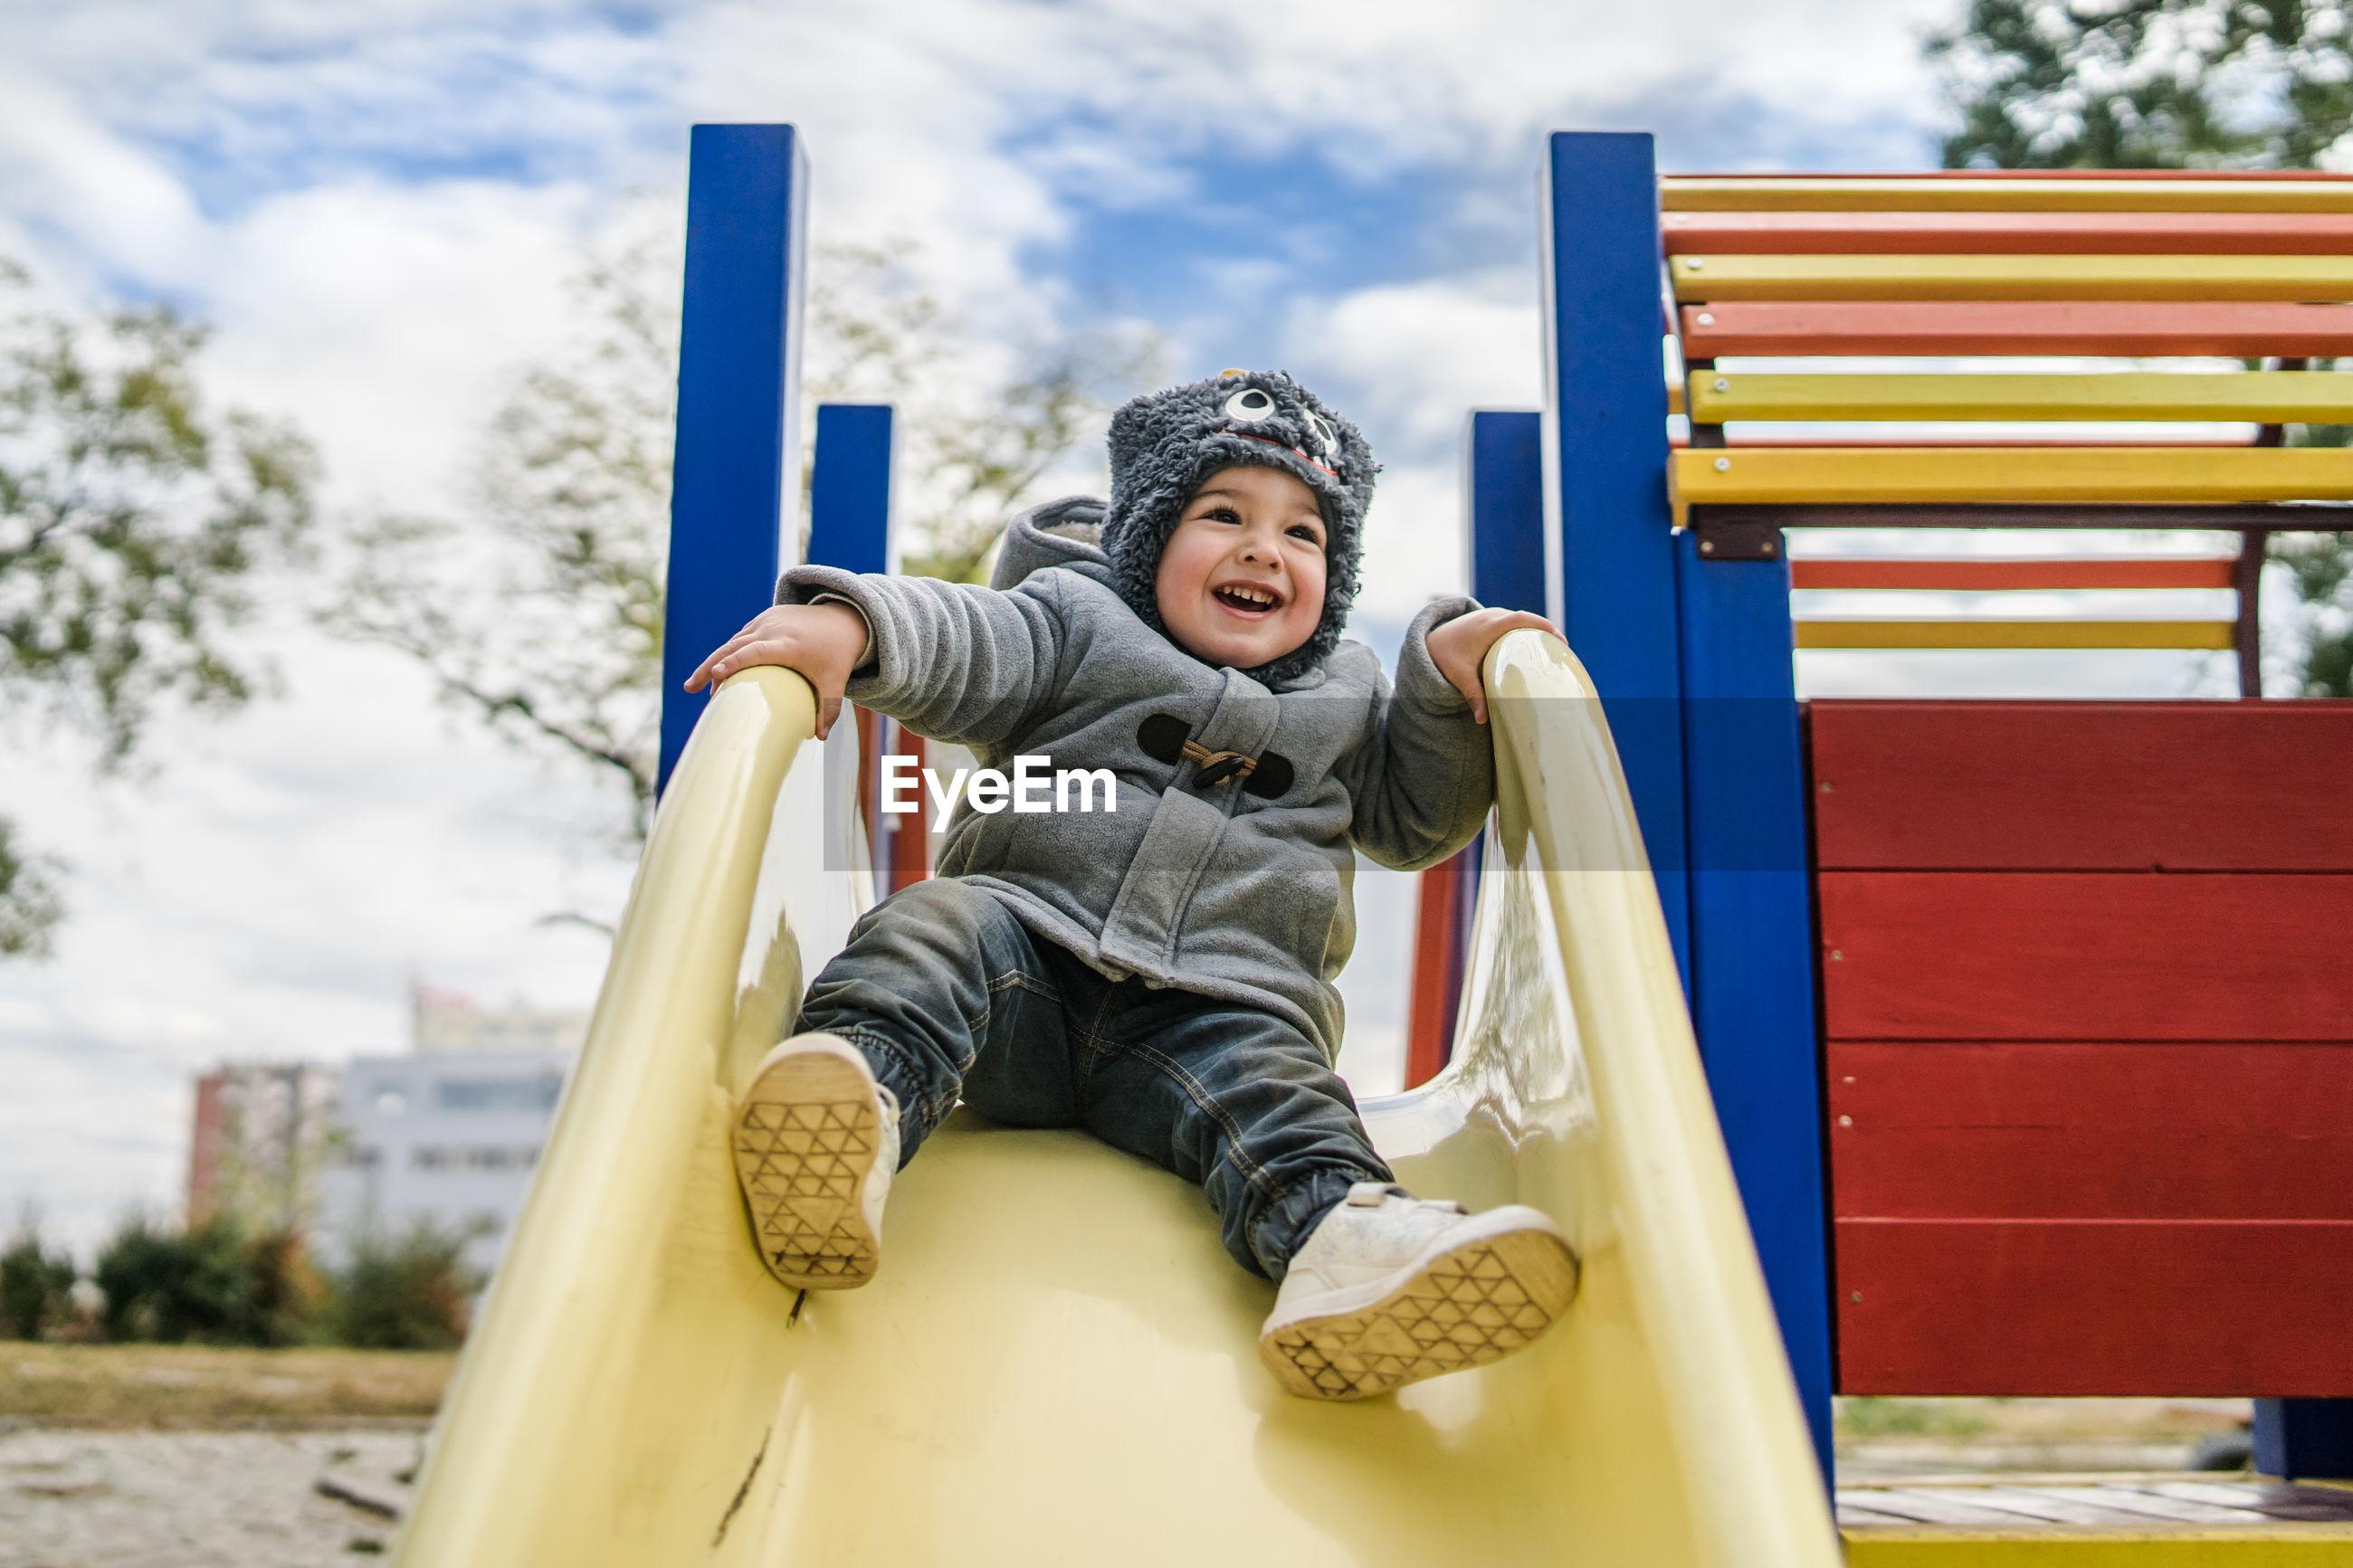 Cheerful boy sitting on slide at playground